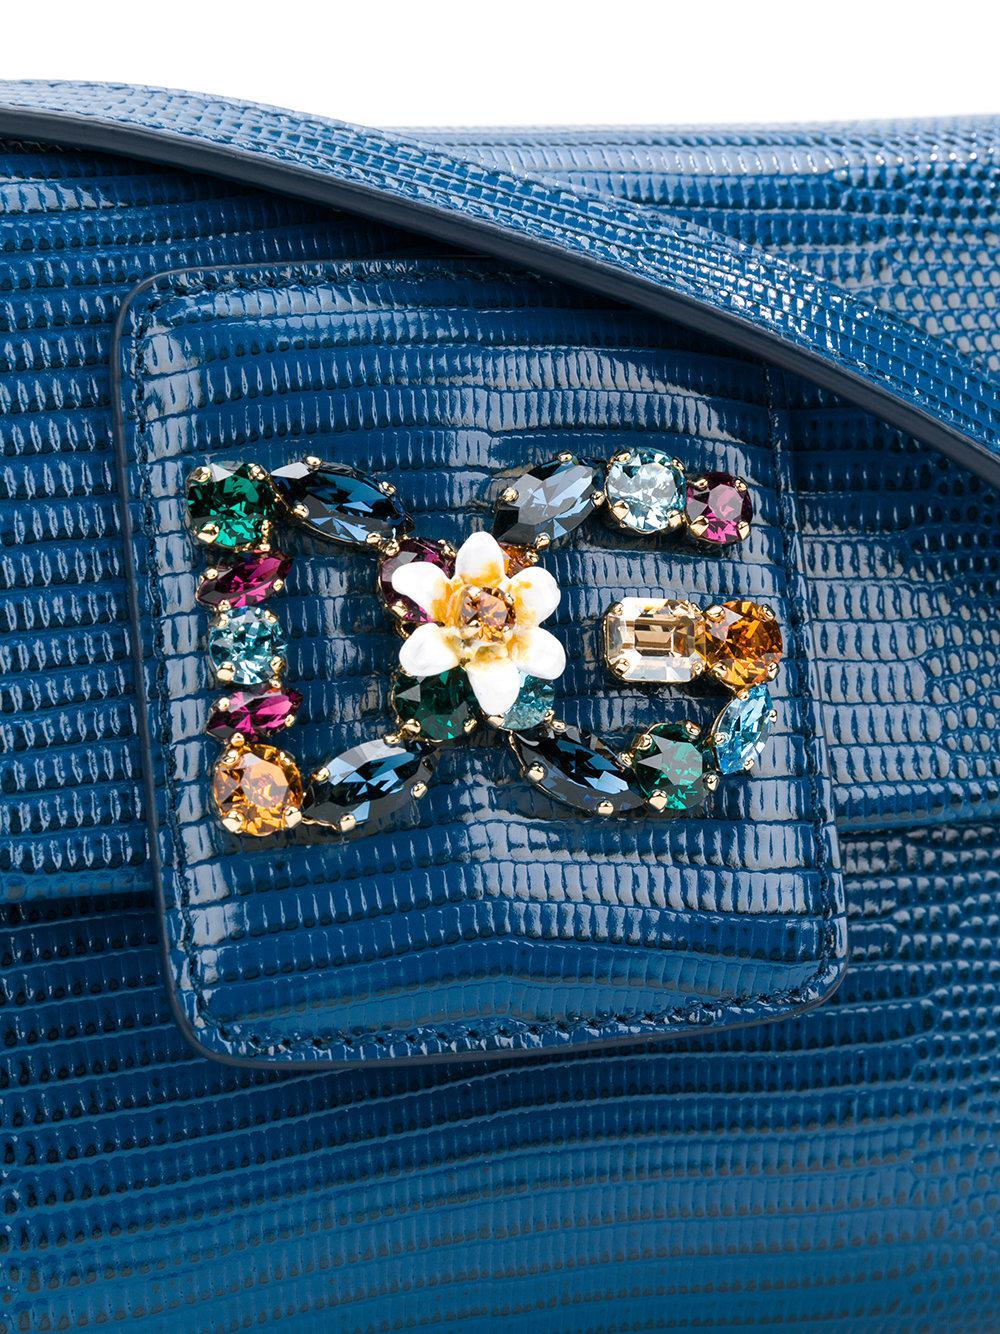 Dolce & Gabbana Leather Small Dg Millennials Crossbody Bag in Blue